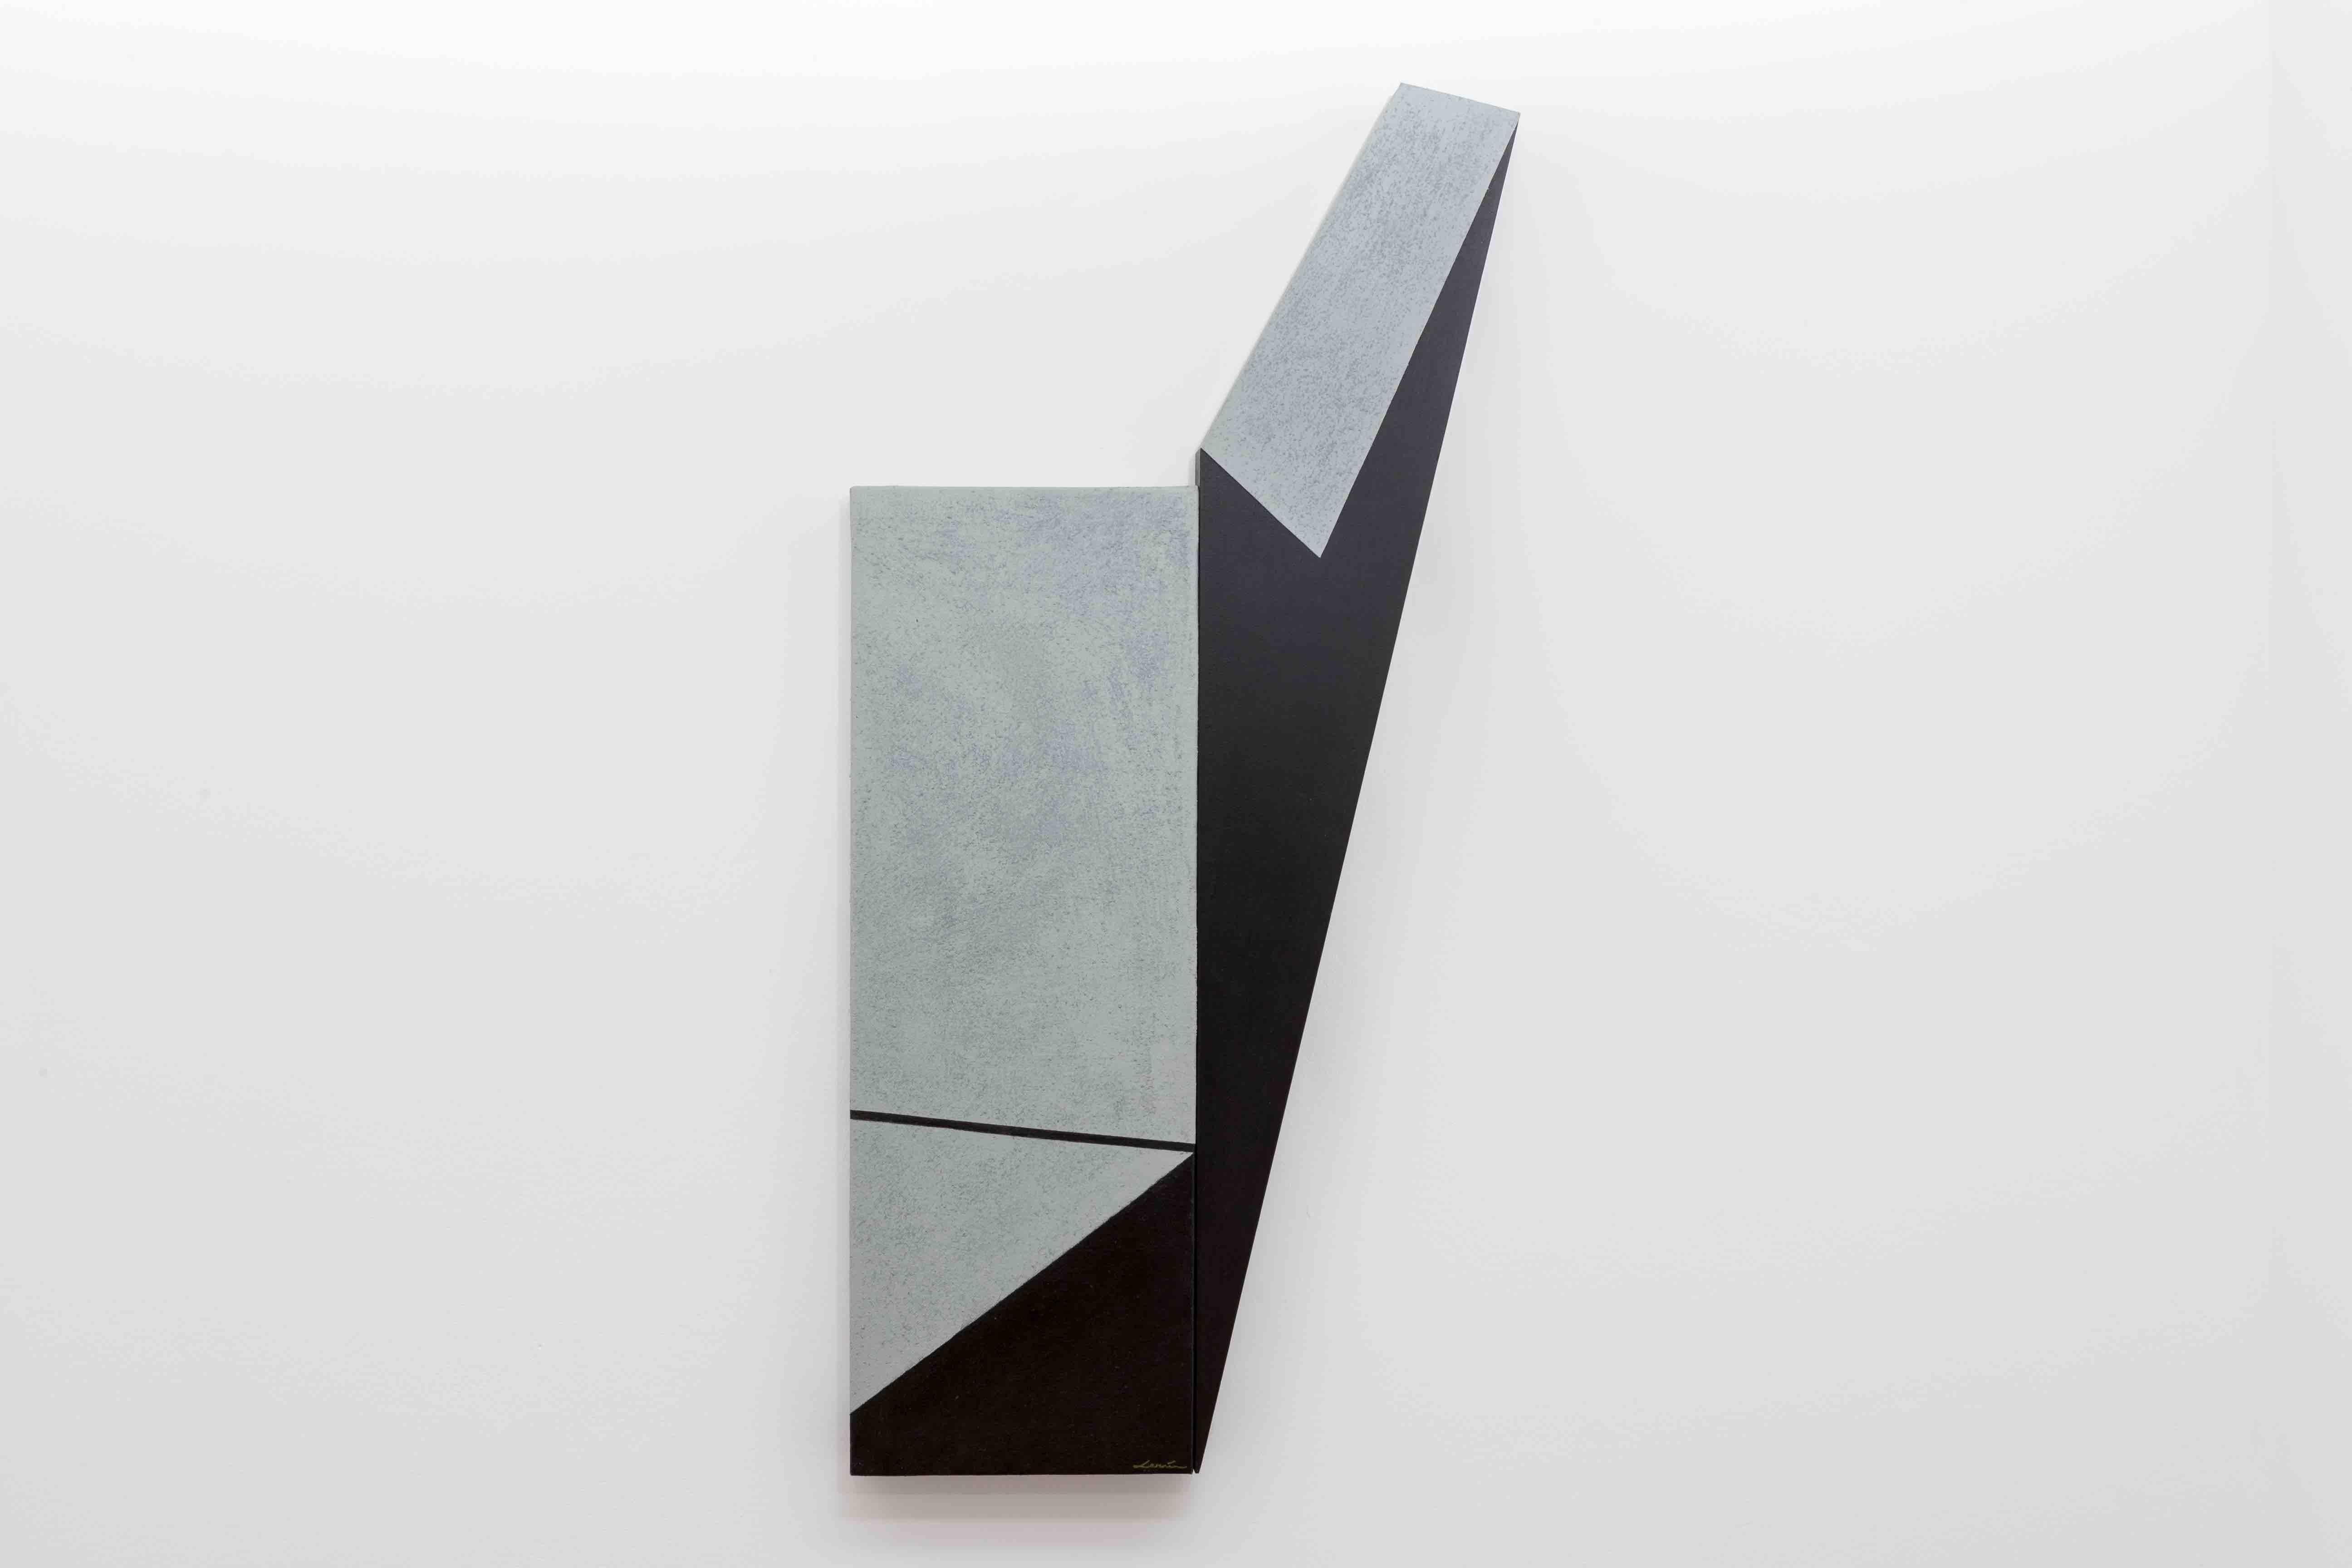 Fissure and Crease (Series Irregulars II) by Spanish artist, Silvia Lerin